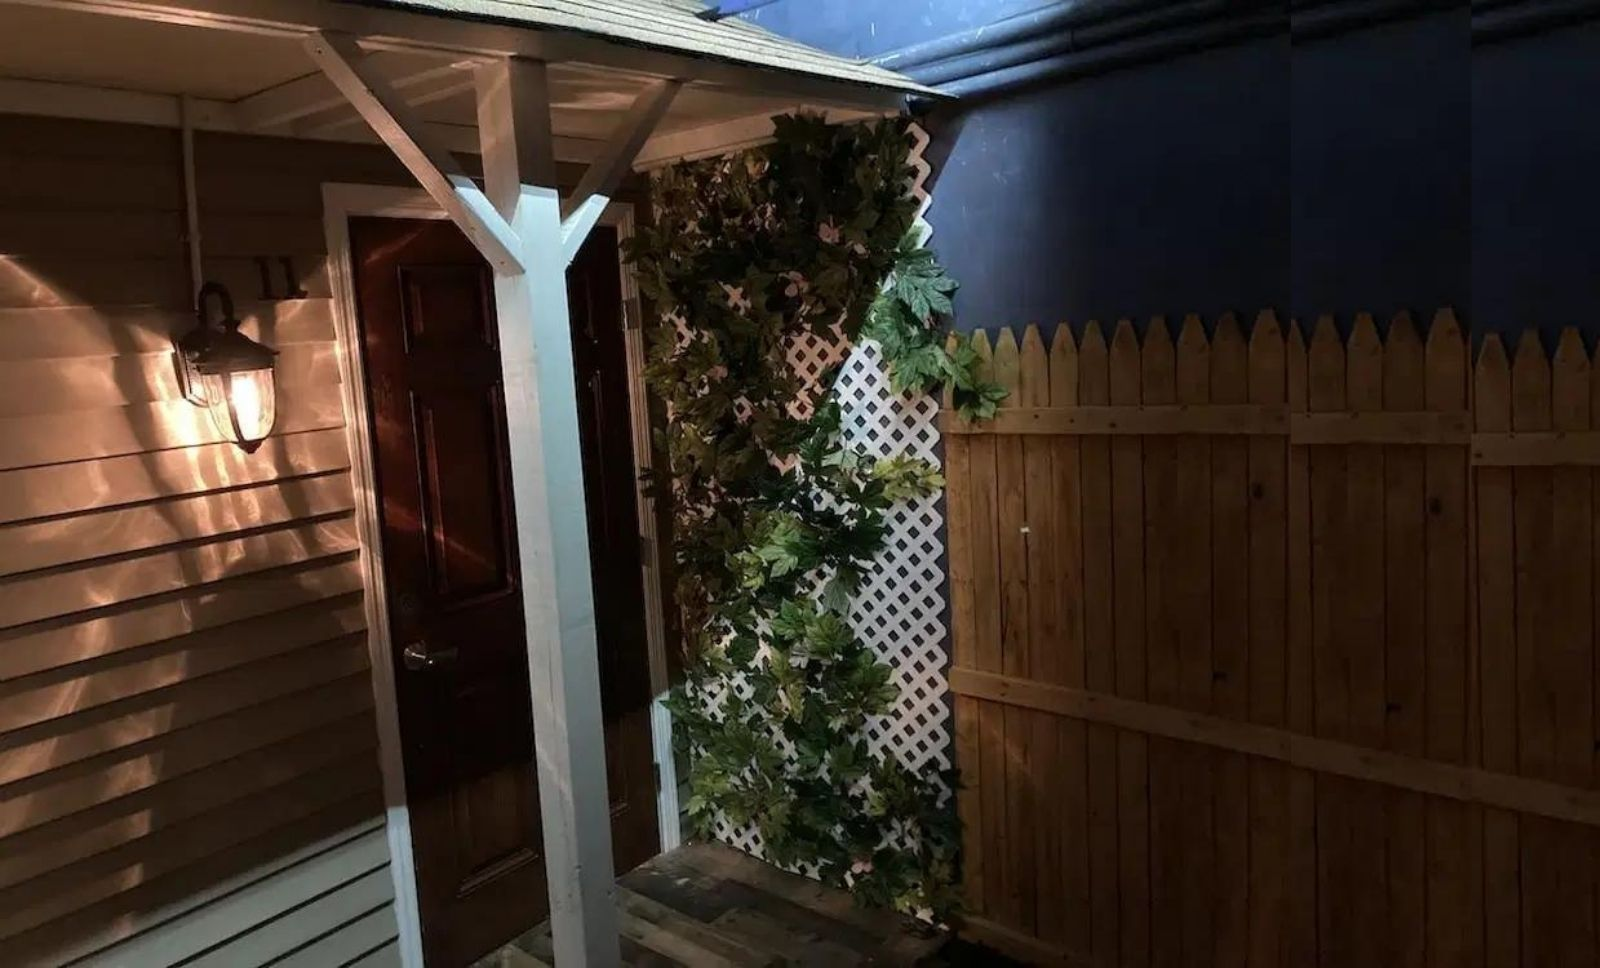 Myss Tic Escape Rooms Montauk Project